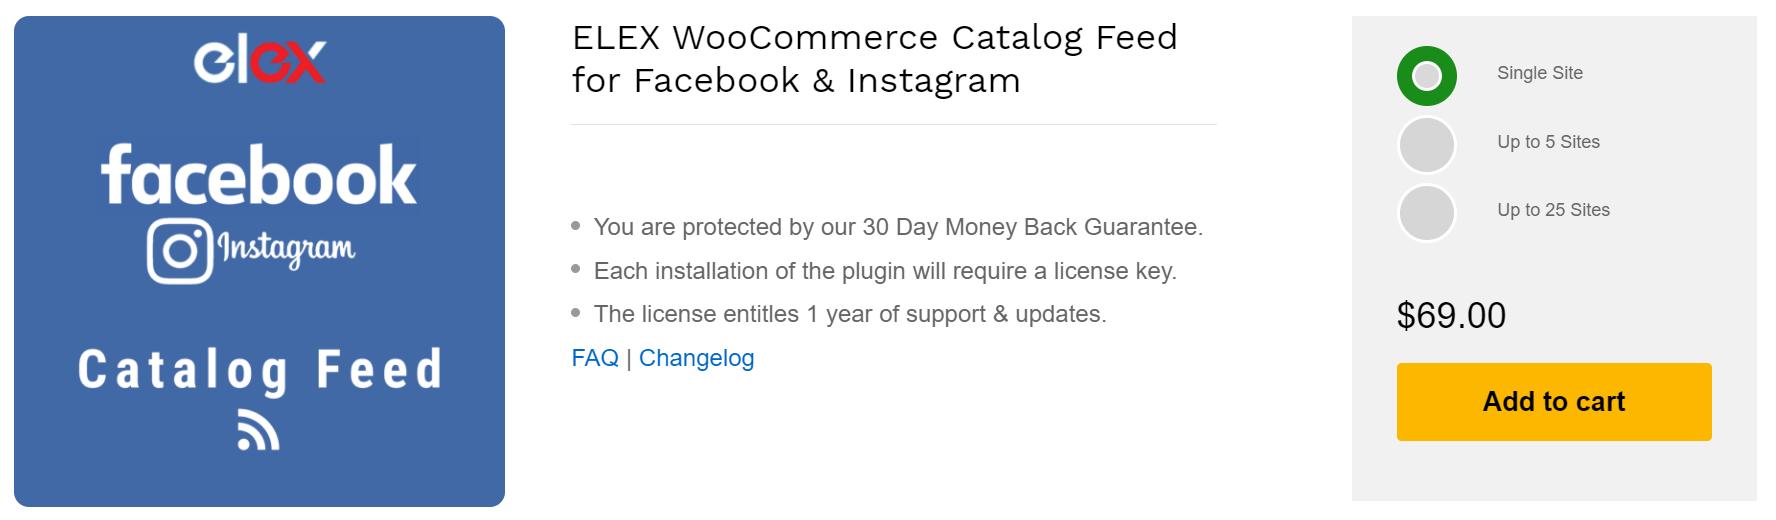 Facebook Catalog feed | WooCommerce Catalog feed | ELEX WooCommerce Catalog Feed for Facebook and Instagram